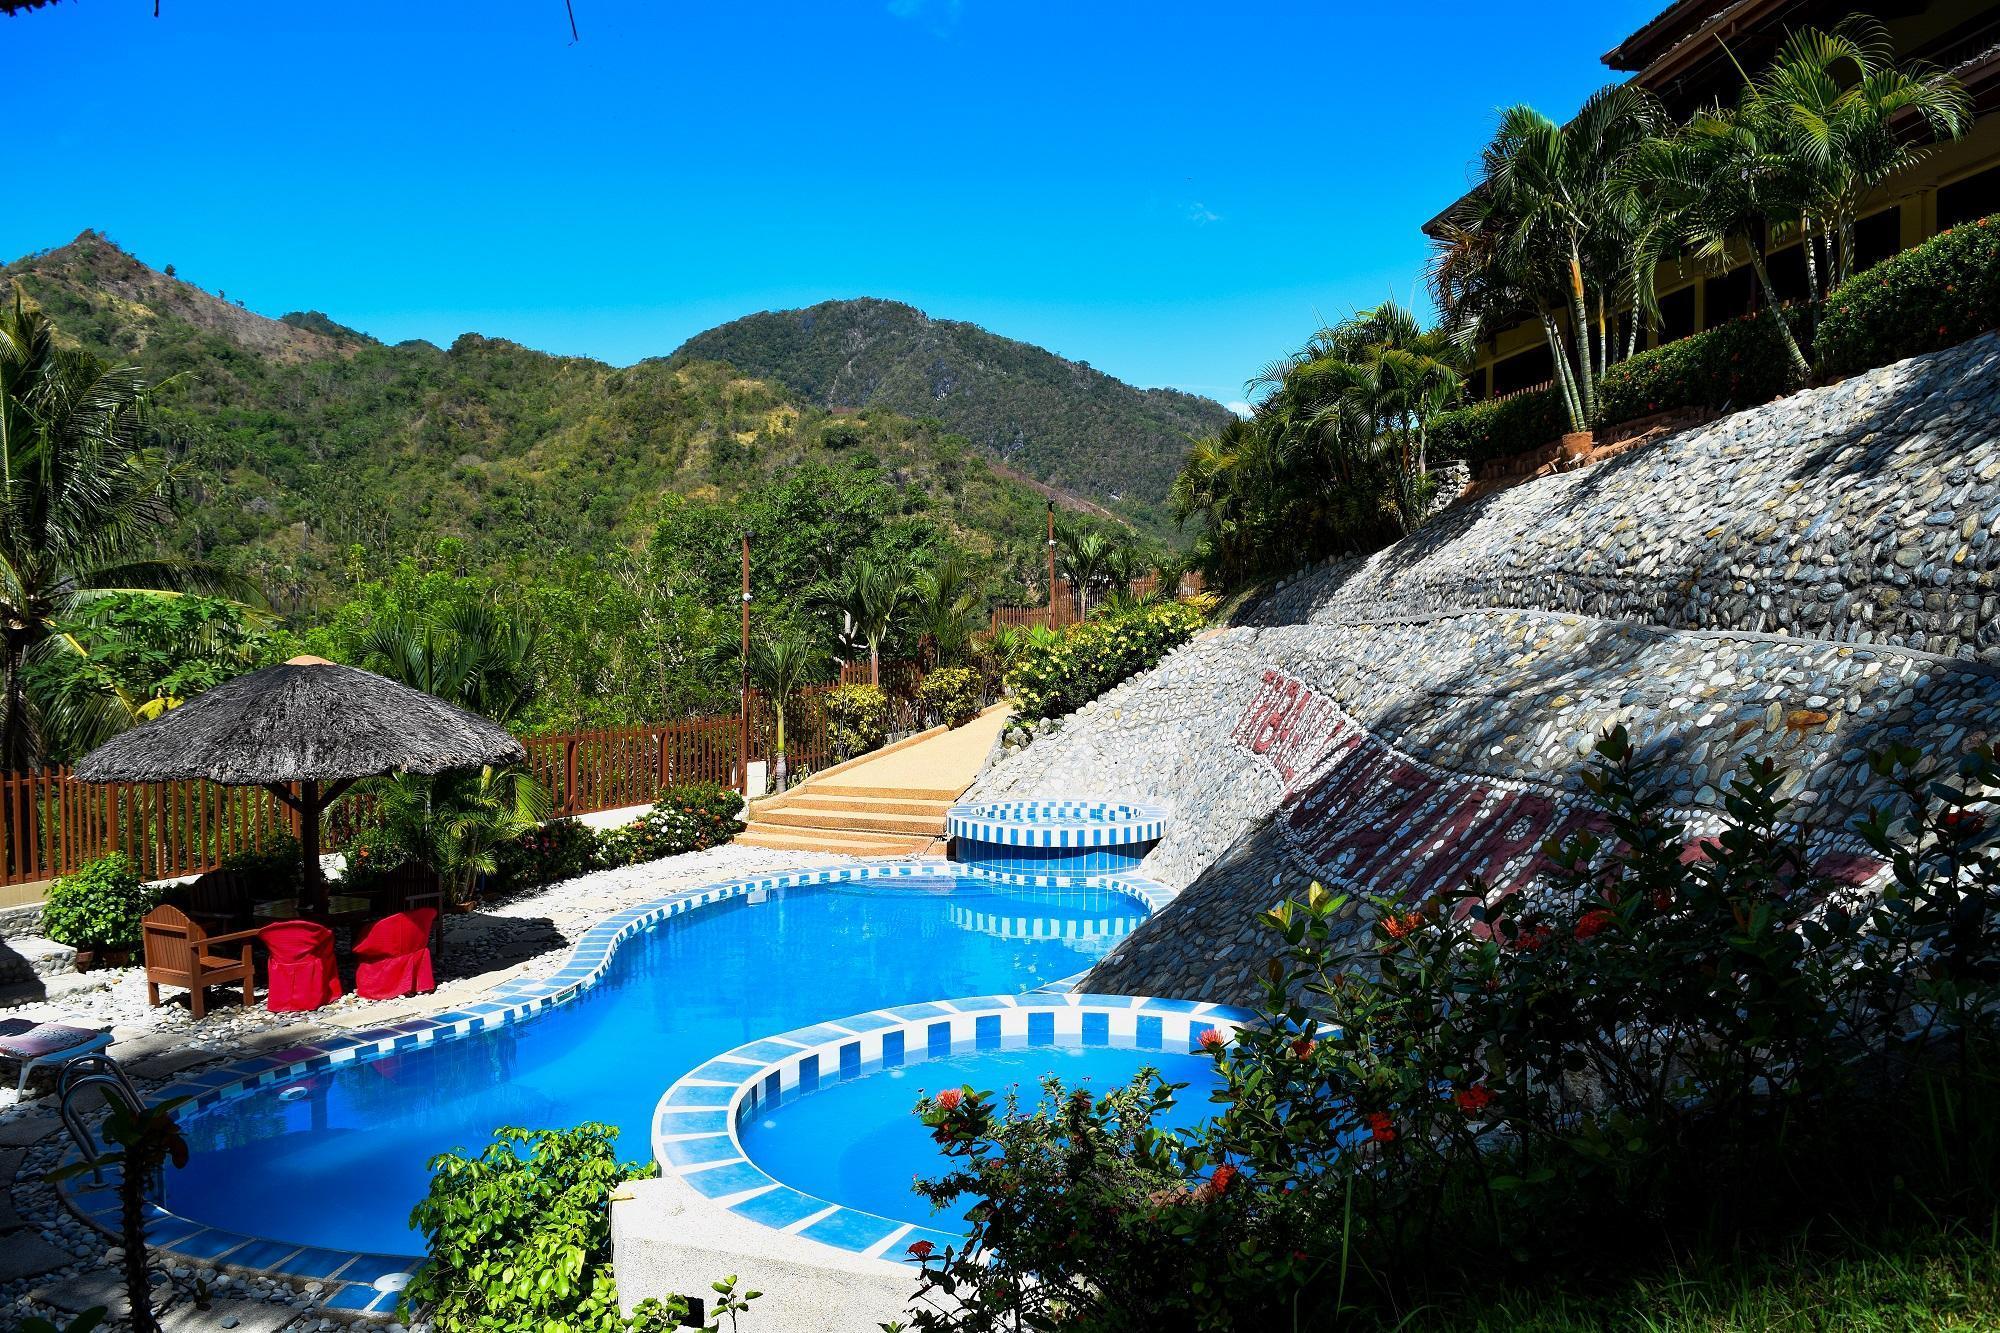 Tribal Hills Mountain Resort